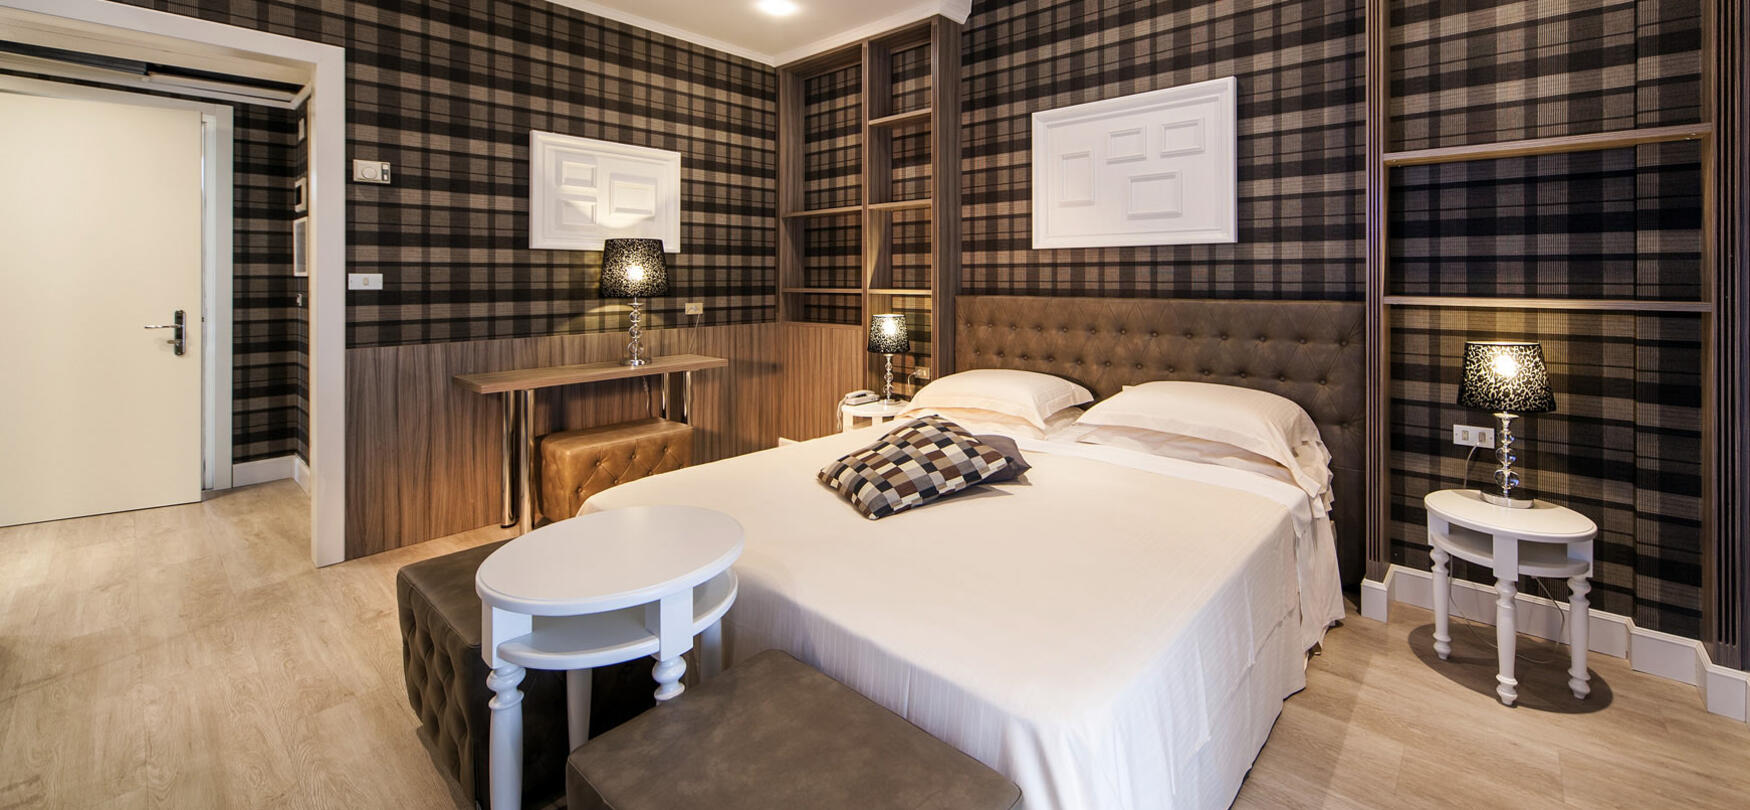 ambienthotels fr chambres-villa-adriatica 006